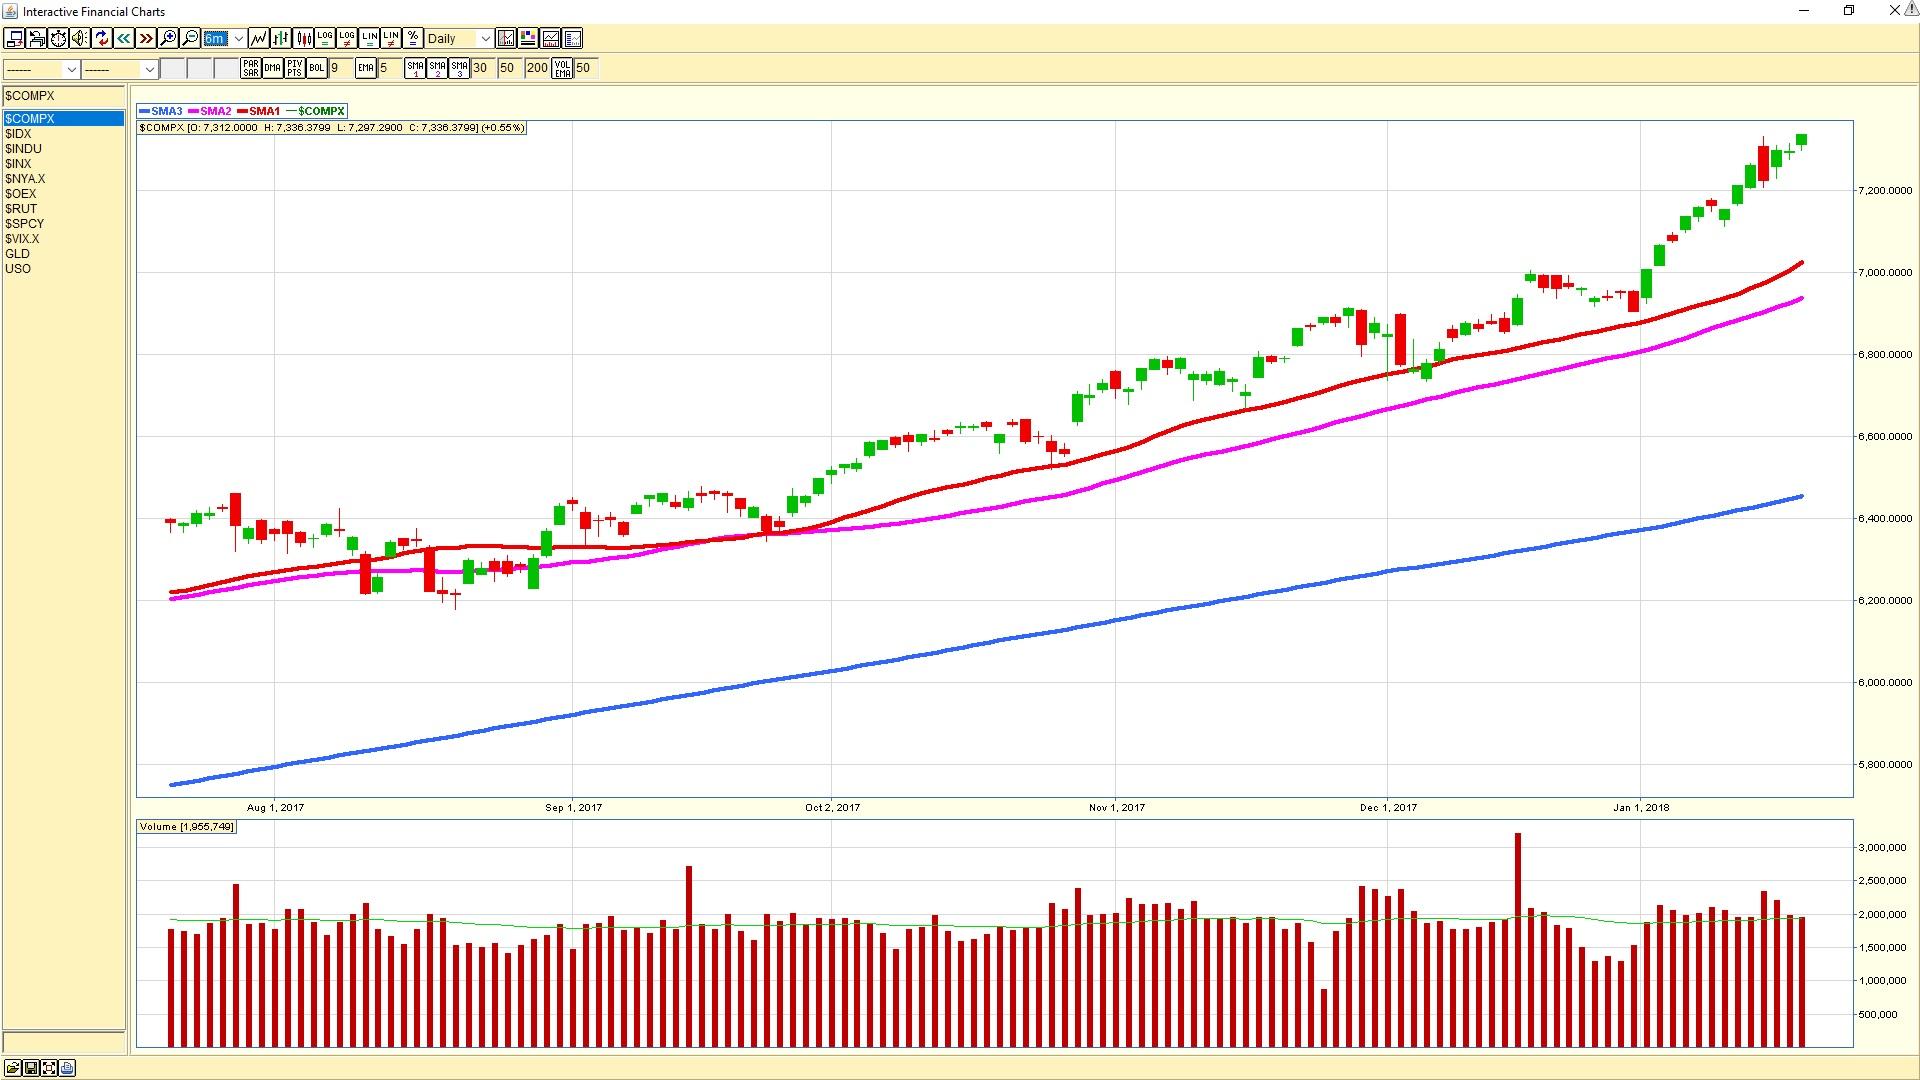 NASDAQ daily chart 20180119